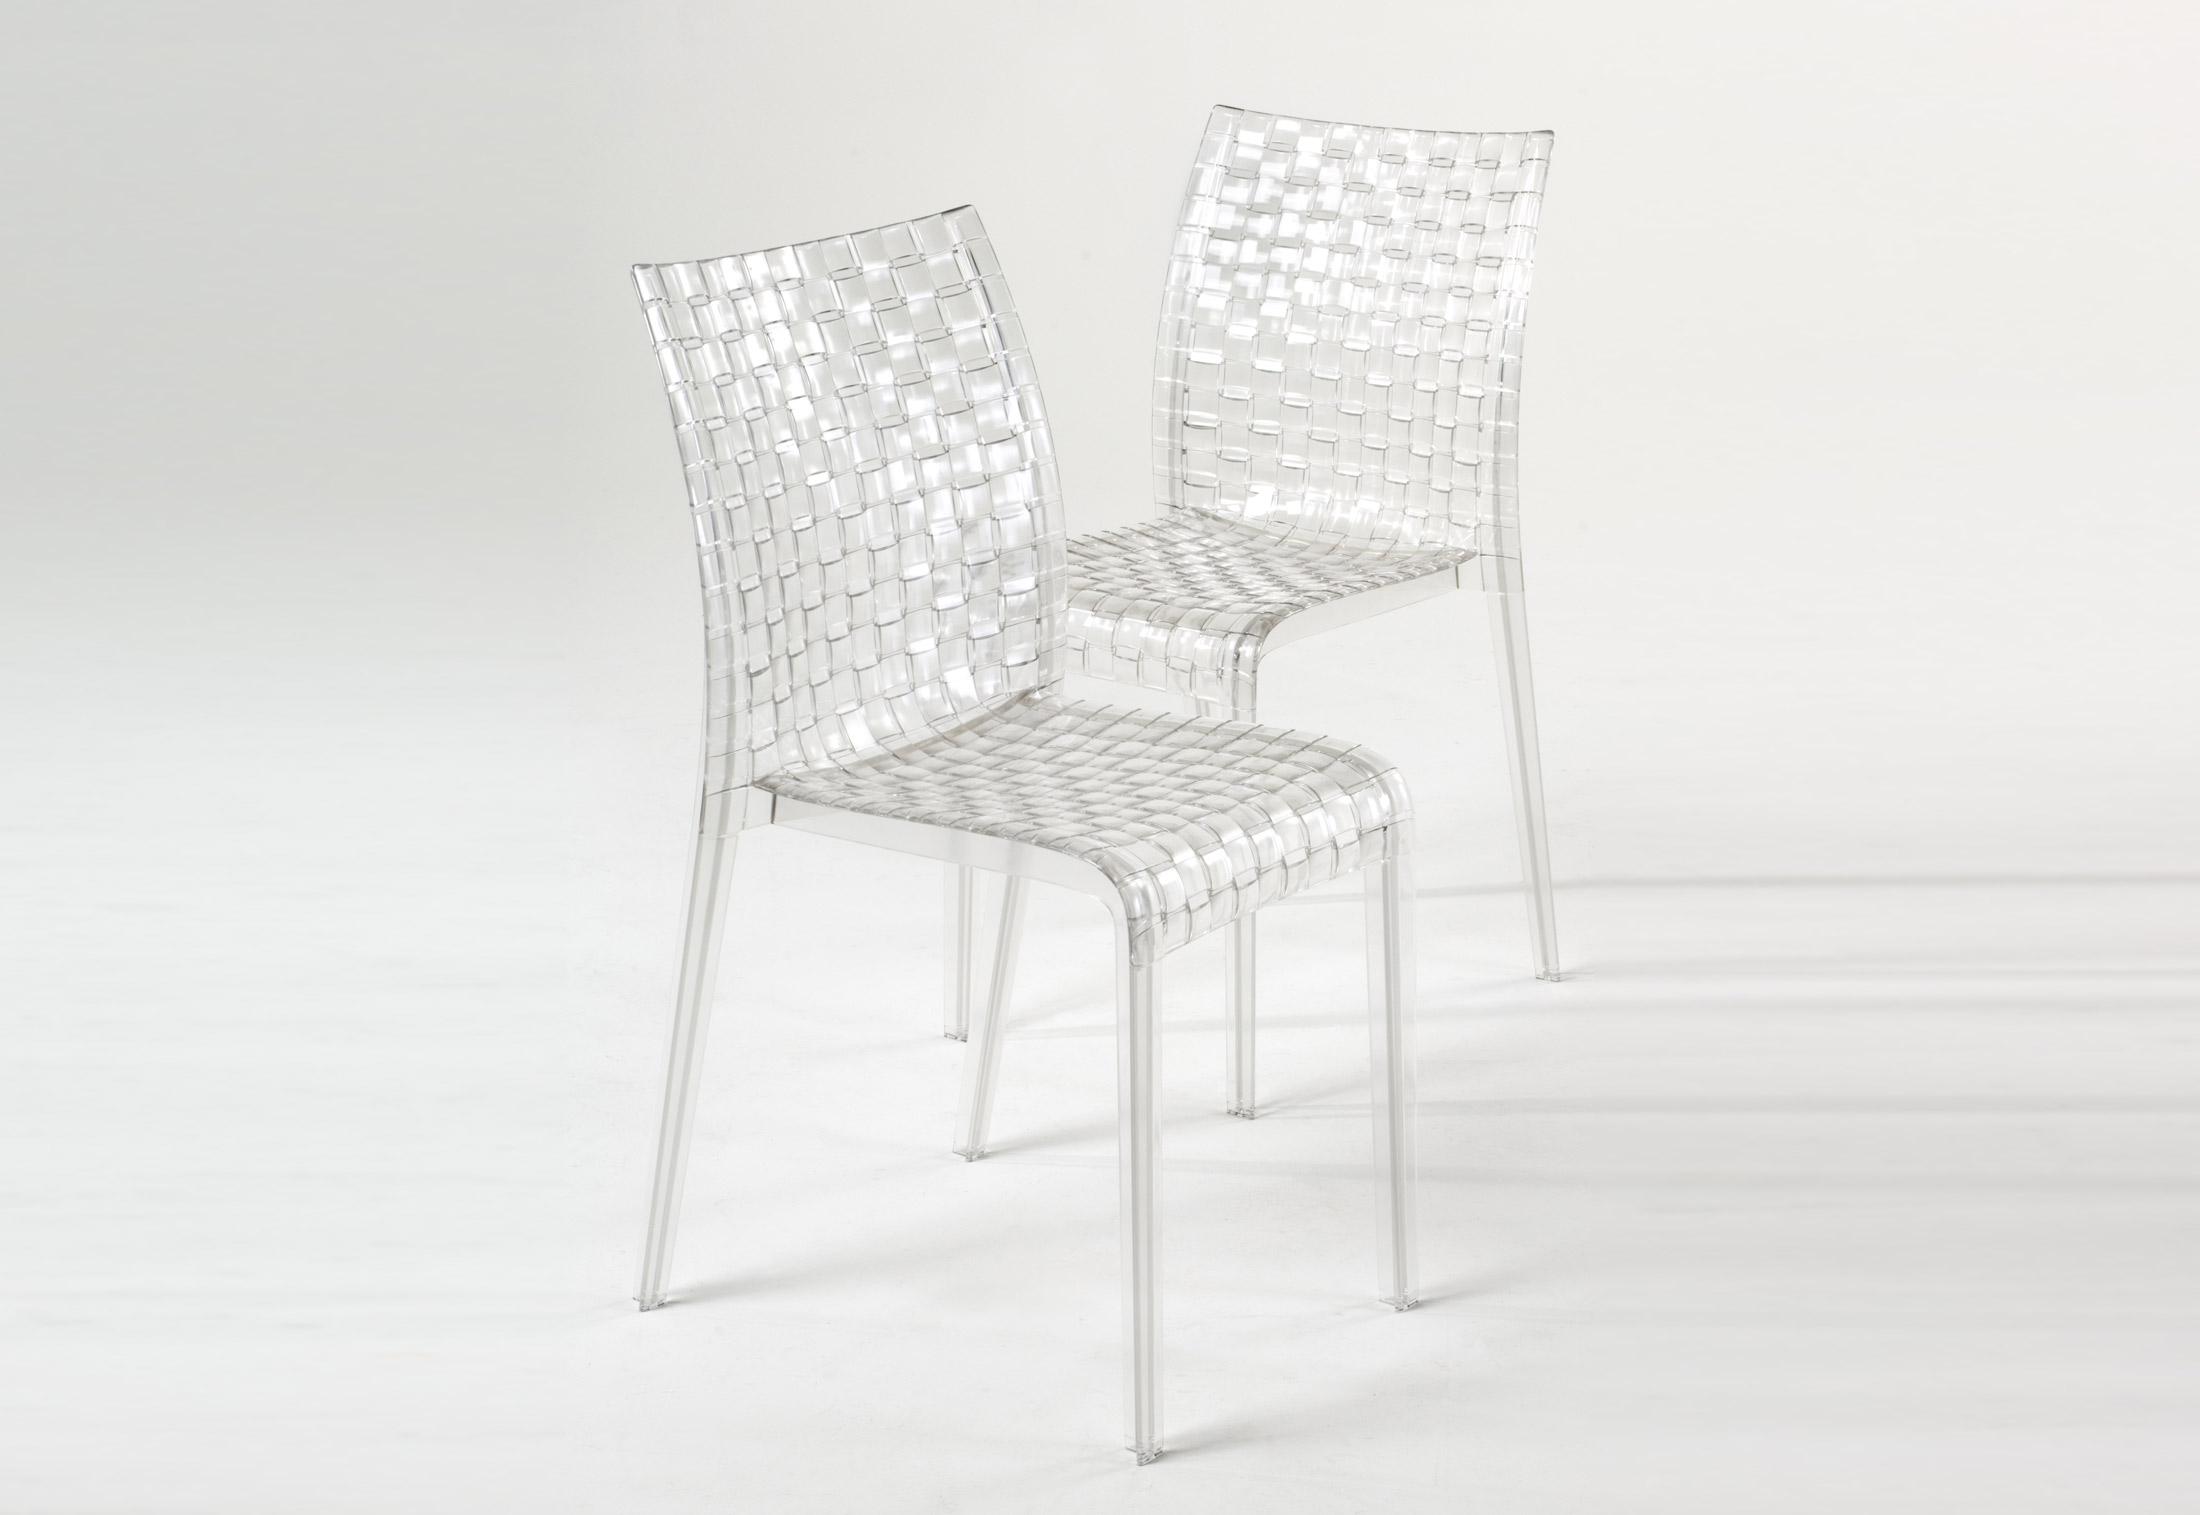 Kartell Sedia Ami Ami : Ami chair di kartell sedie poltroncine